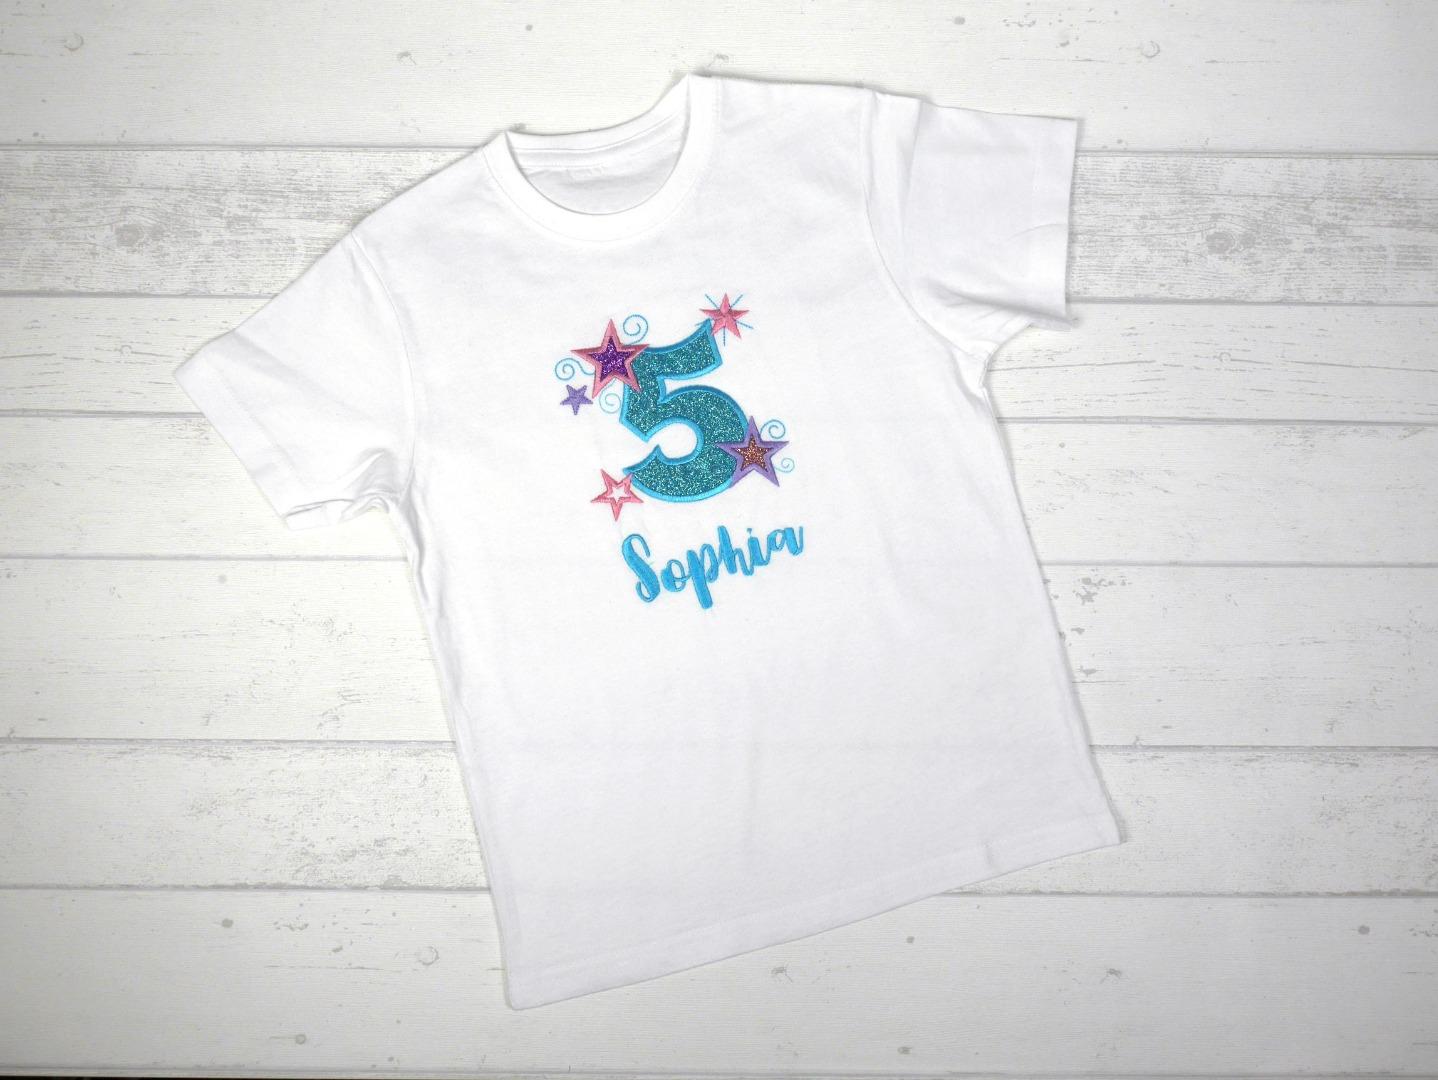 Shirt Geburtstag Sterne personalisierbar mit Name